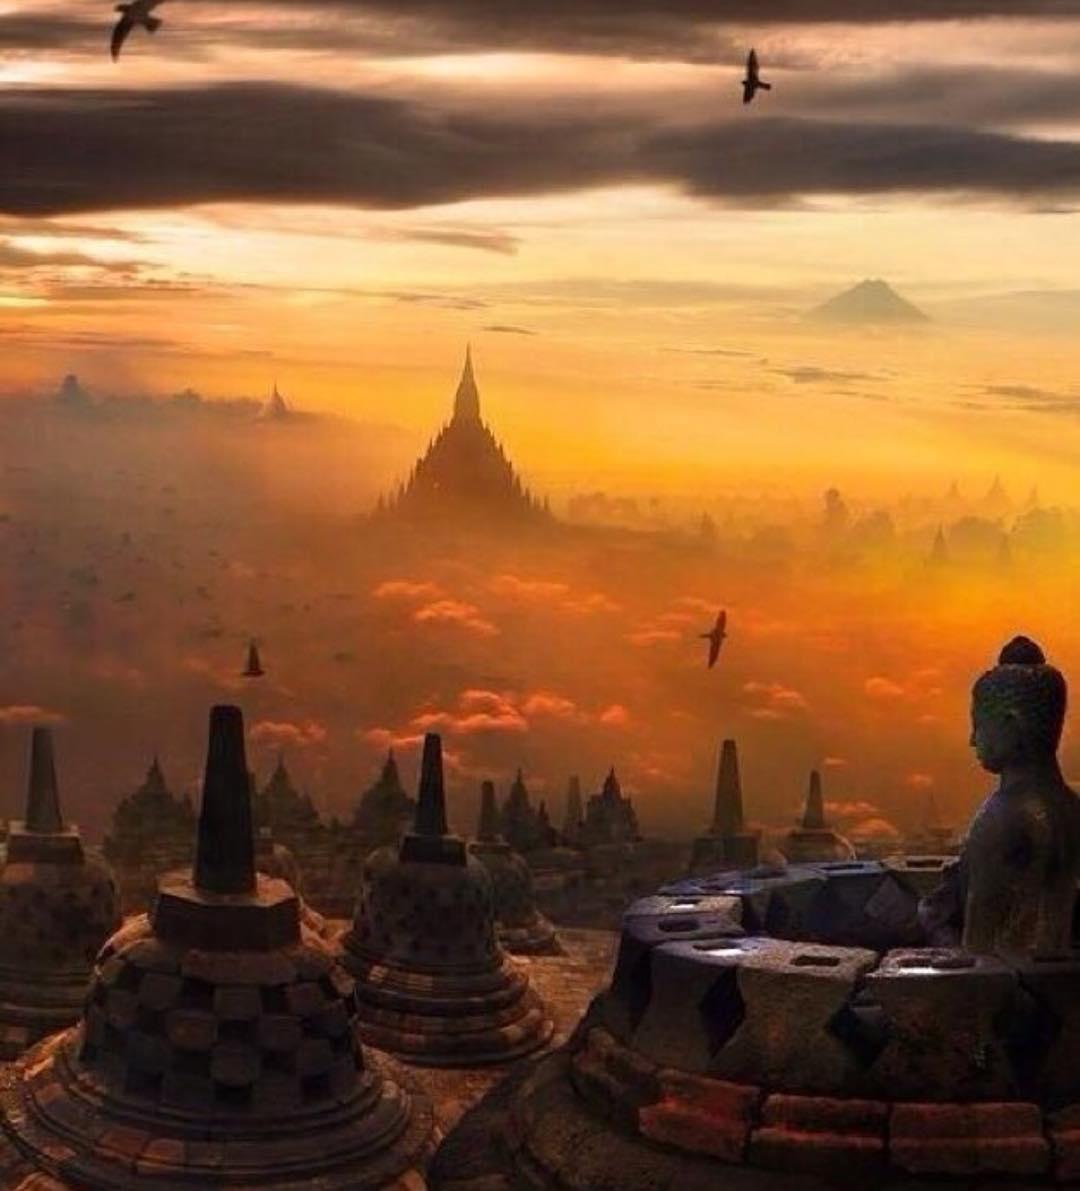 Harga Tiket Masuk Candi Borobudur Terbaru 2017